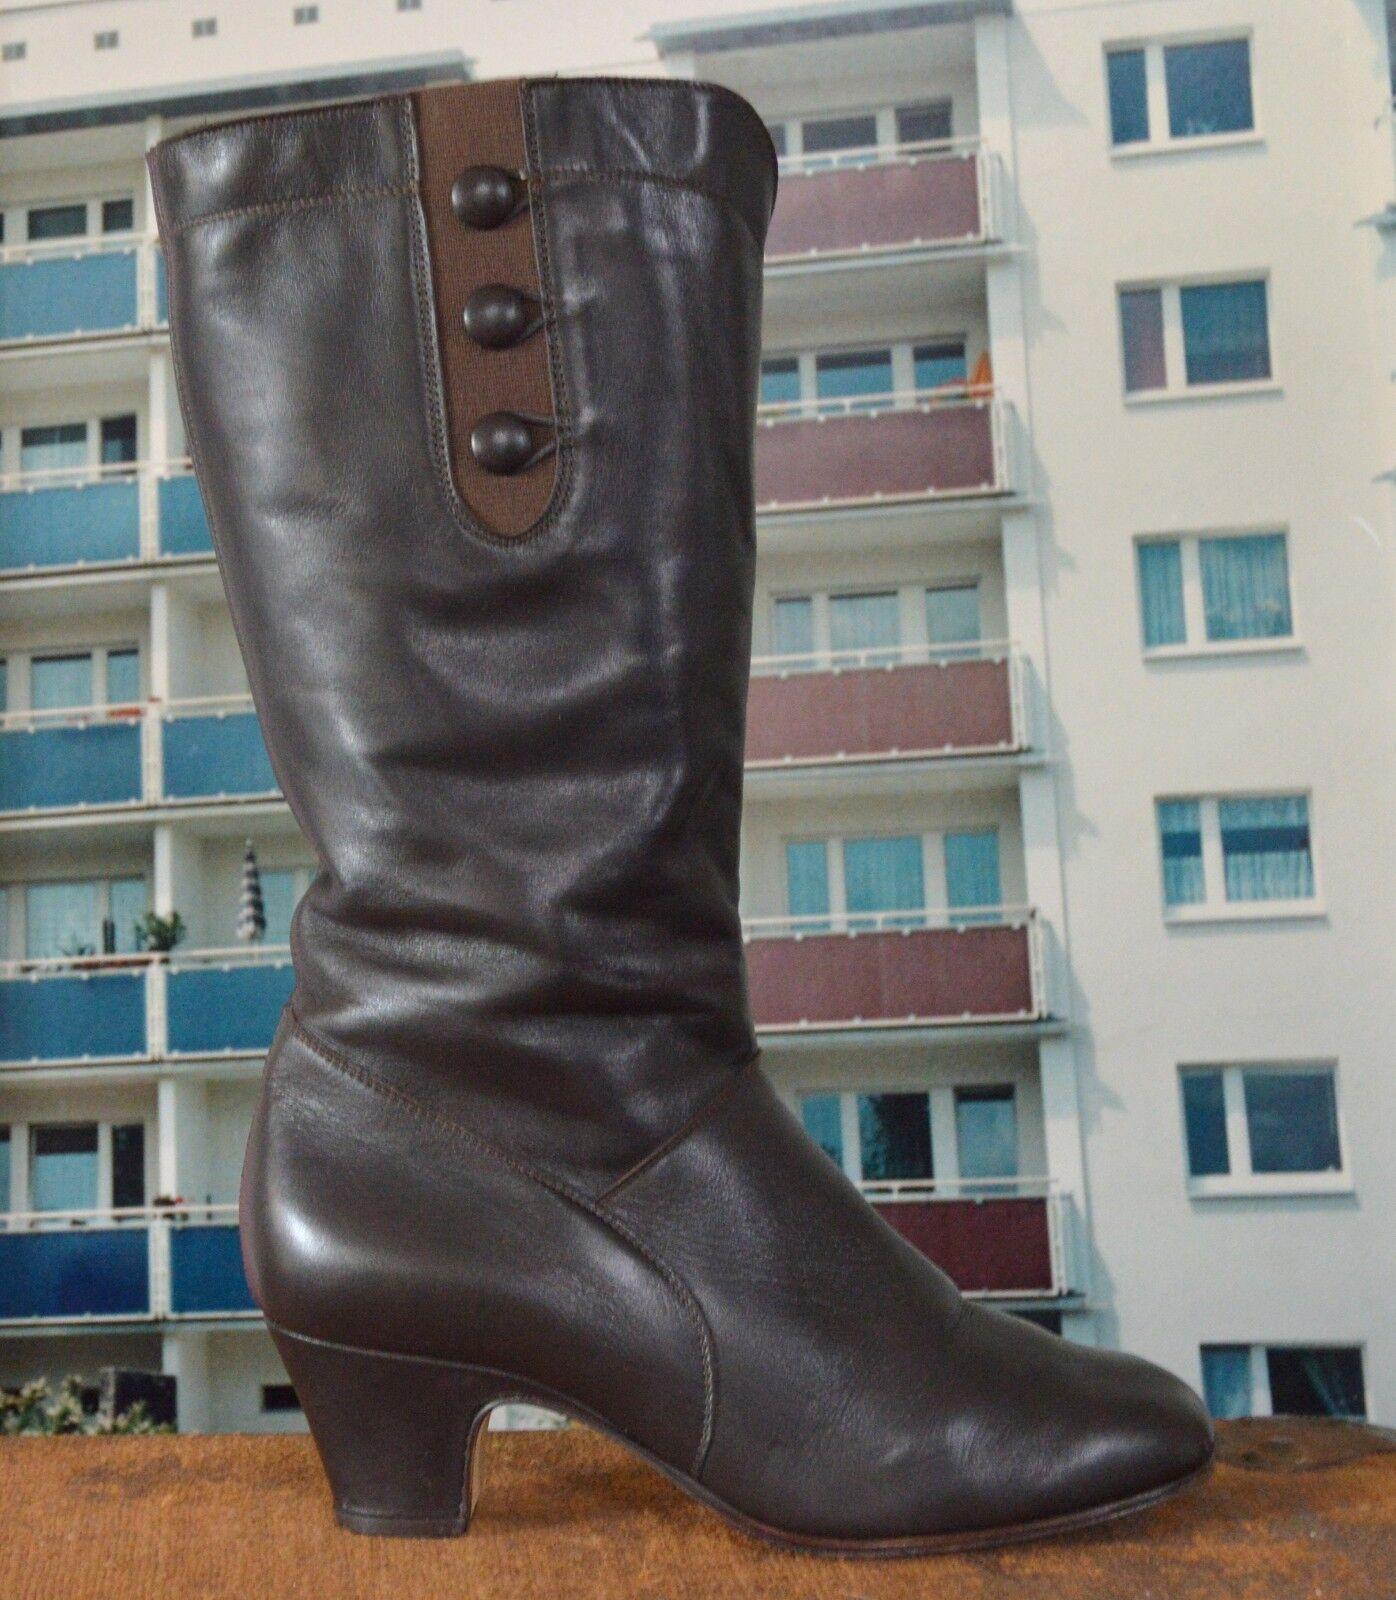 botas señora botas meisi nos 80er True vintage 90er señora botas marrón marrón